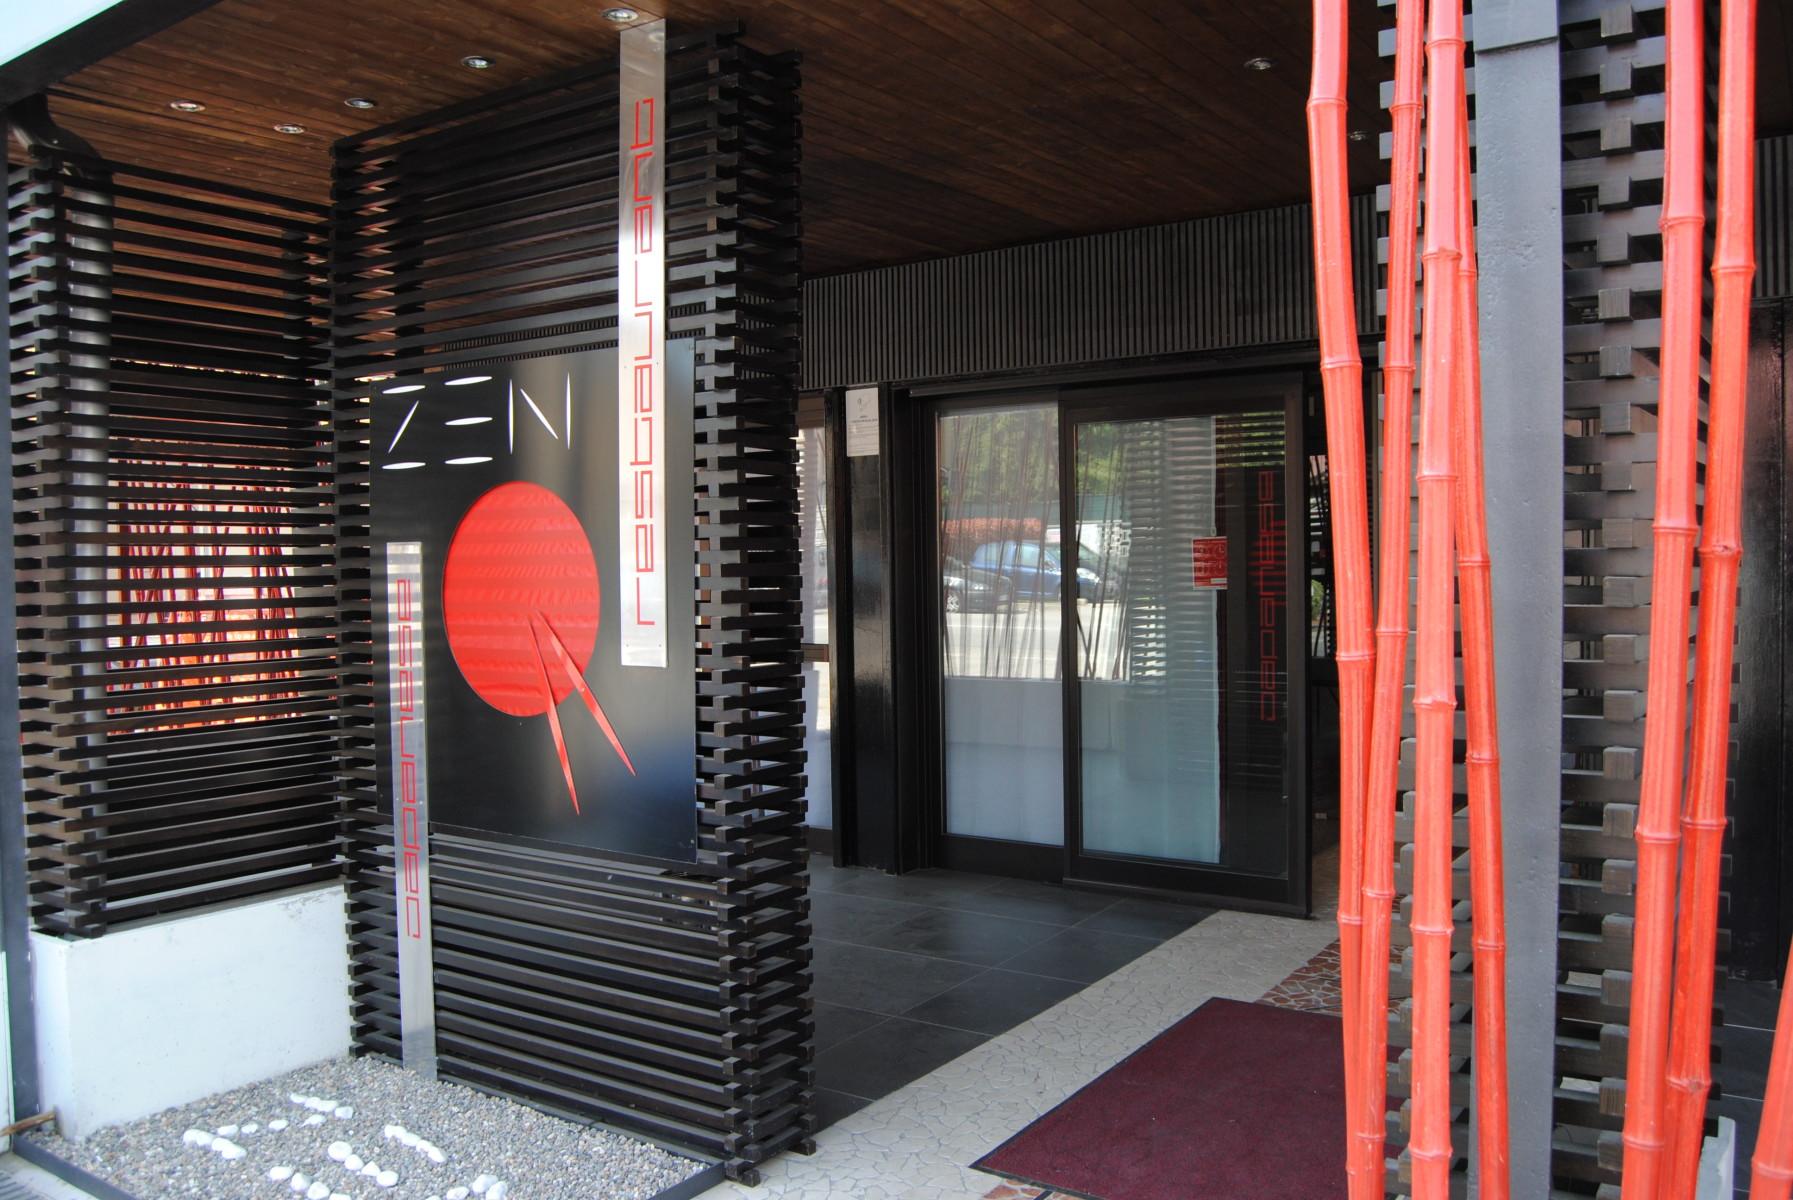 ristorante - ristoranze zenristoranze zen - Arredamento Moderno Giapponese